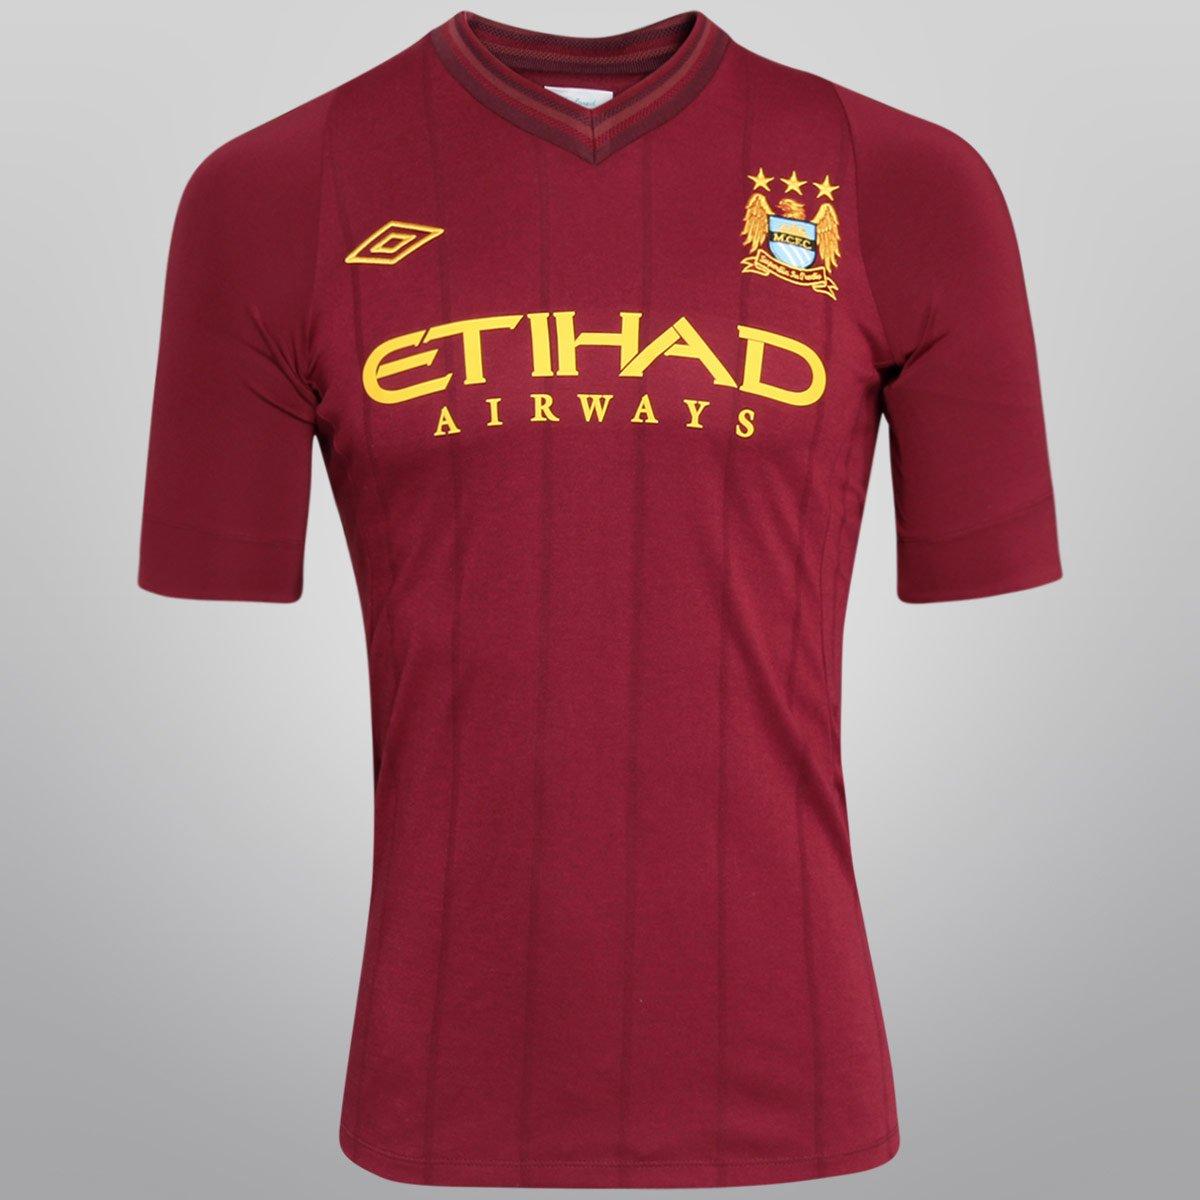 86756bba68 Camisa Umbro Manchester City Away 12 13 s nº - Compre Agora